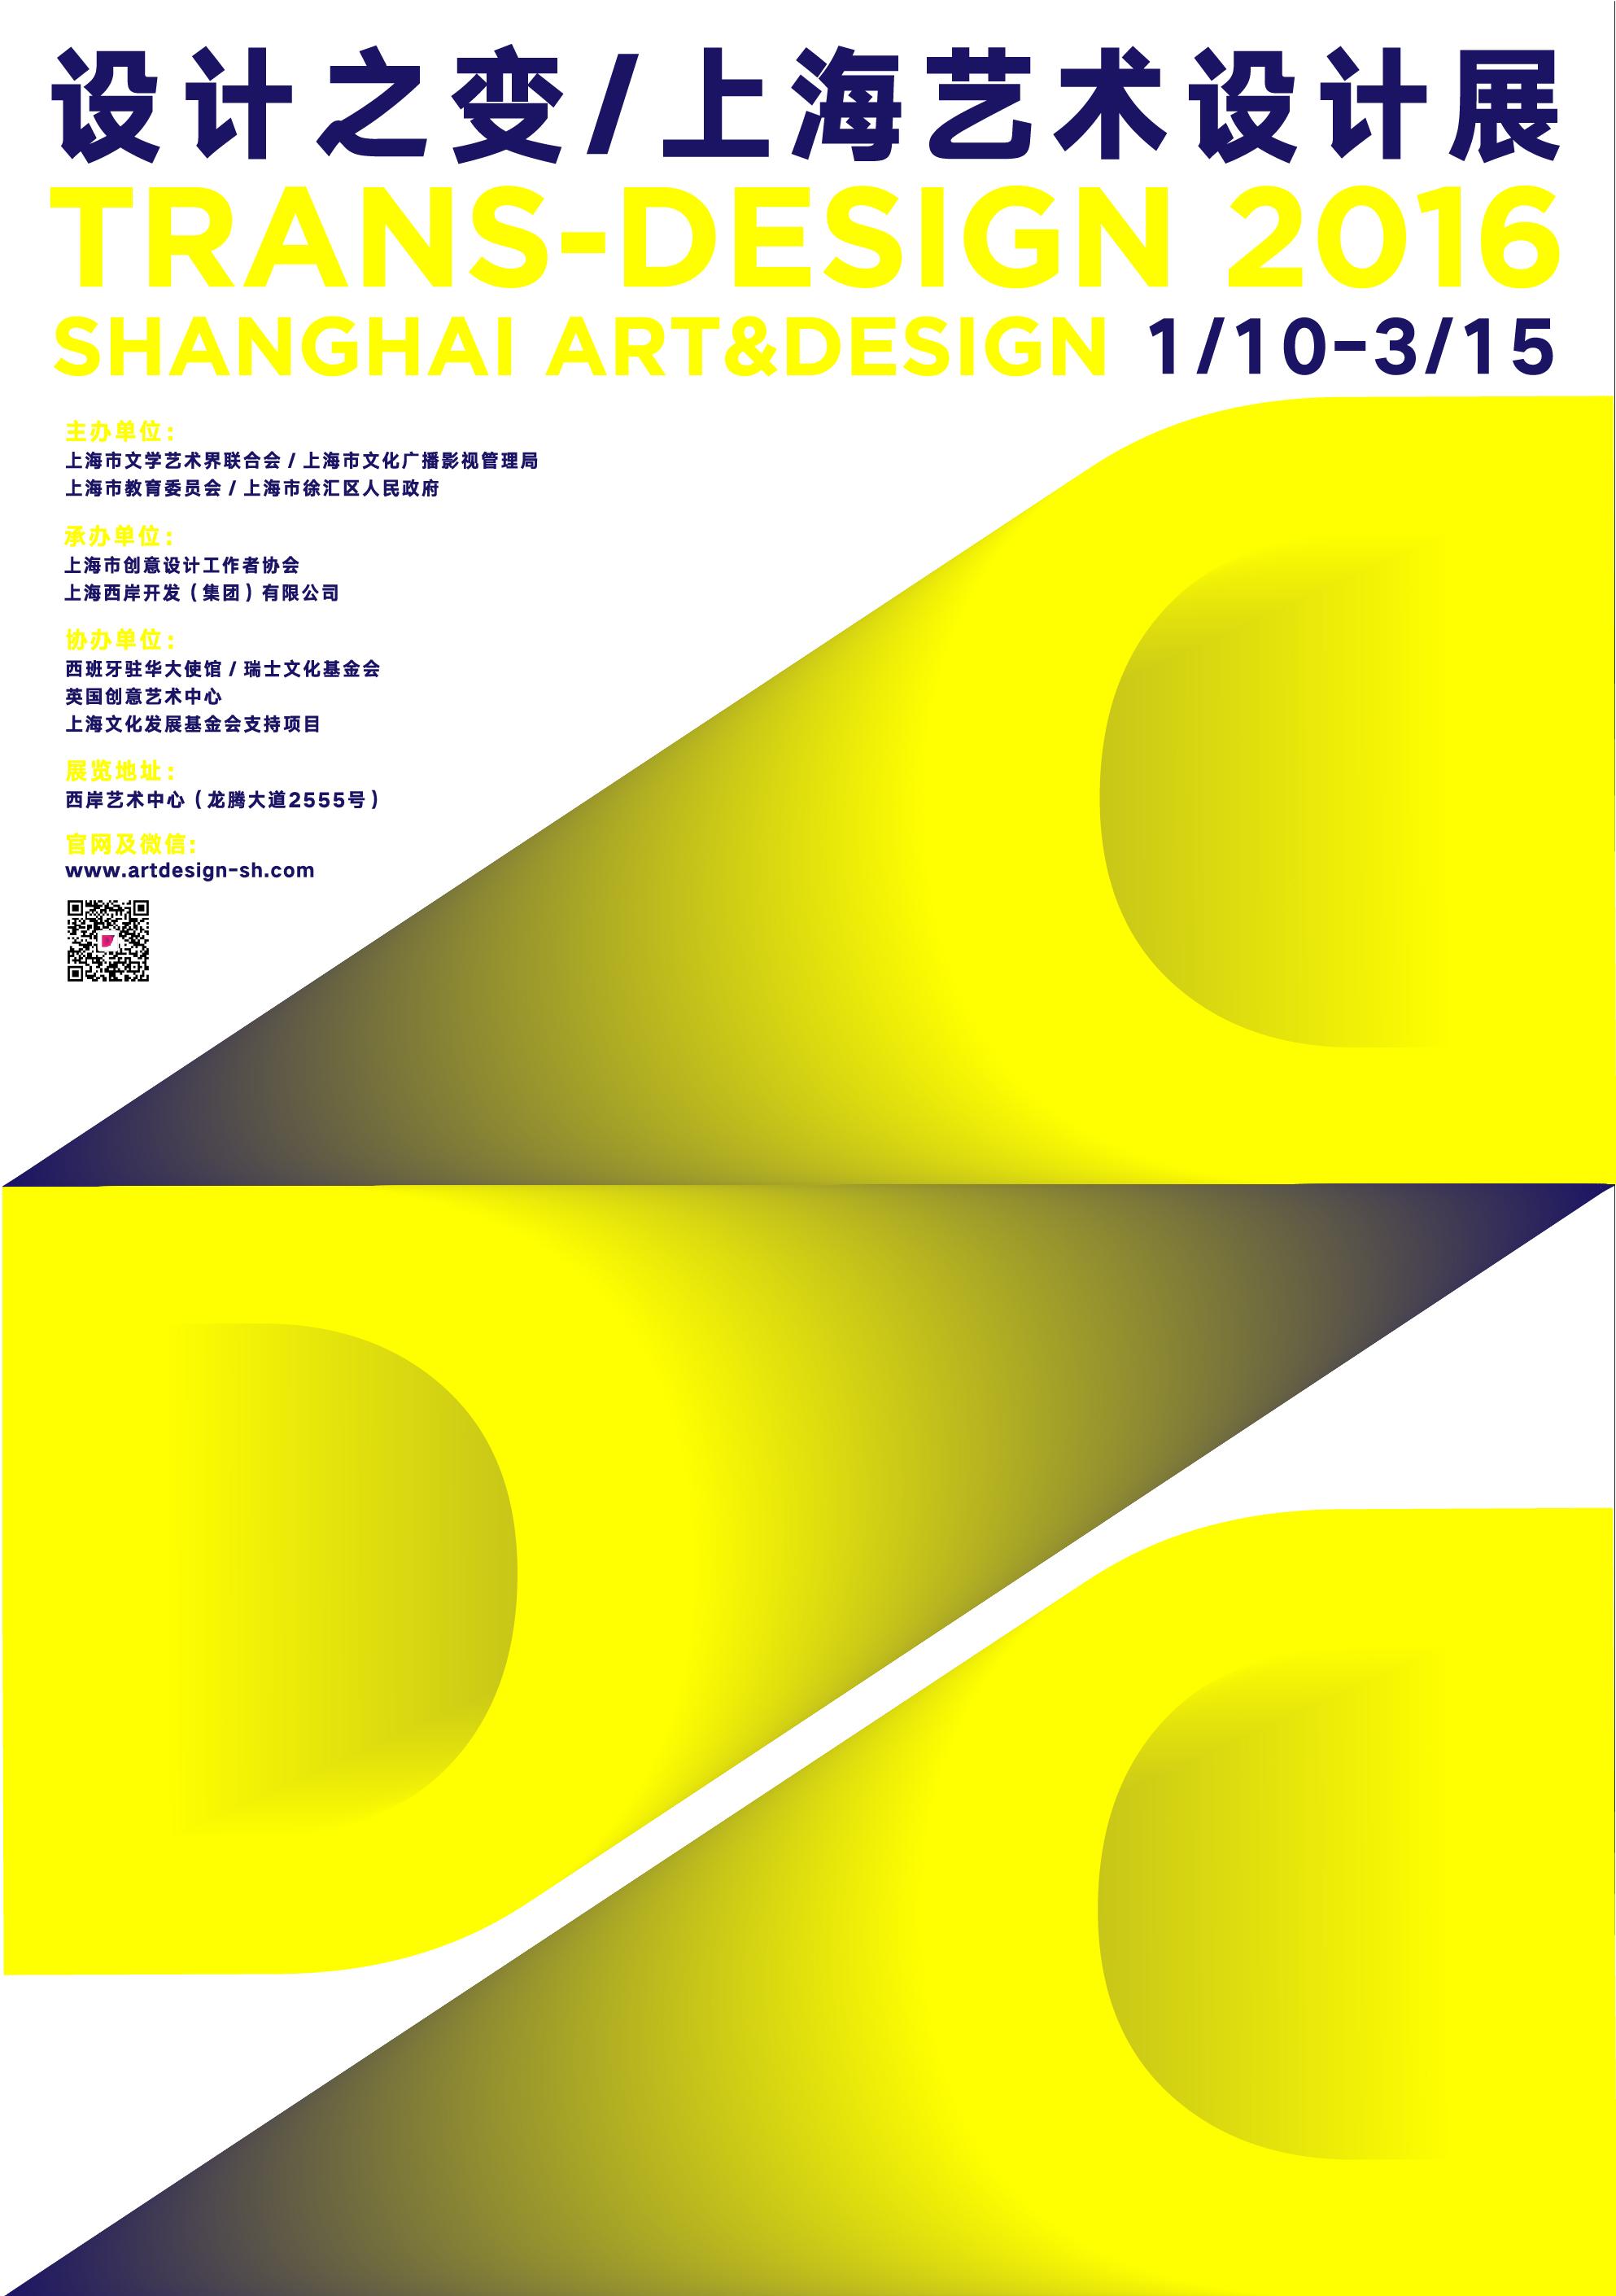 Trans-design / Shanghai Art & Design Exhibition